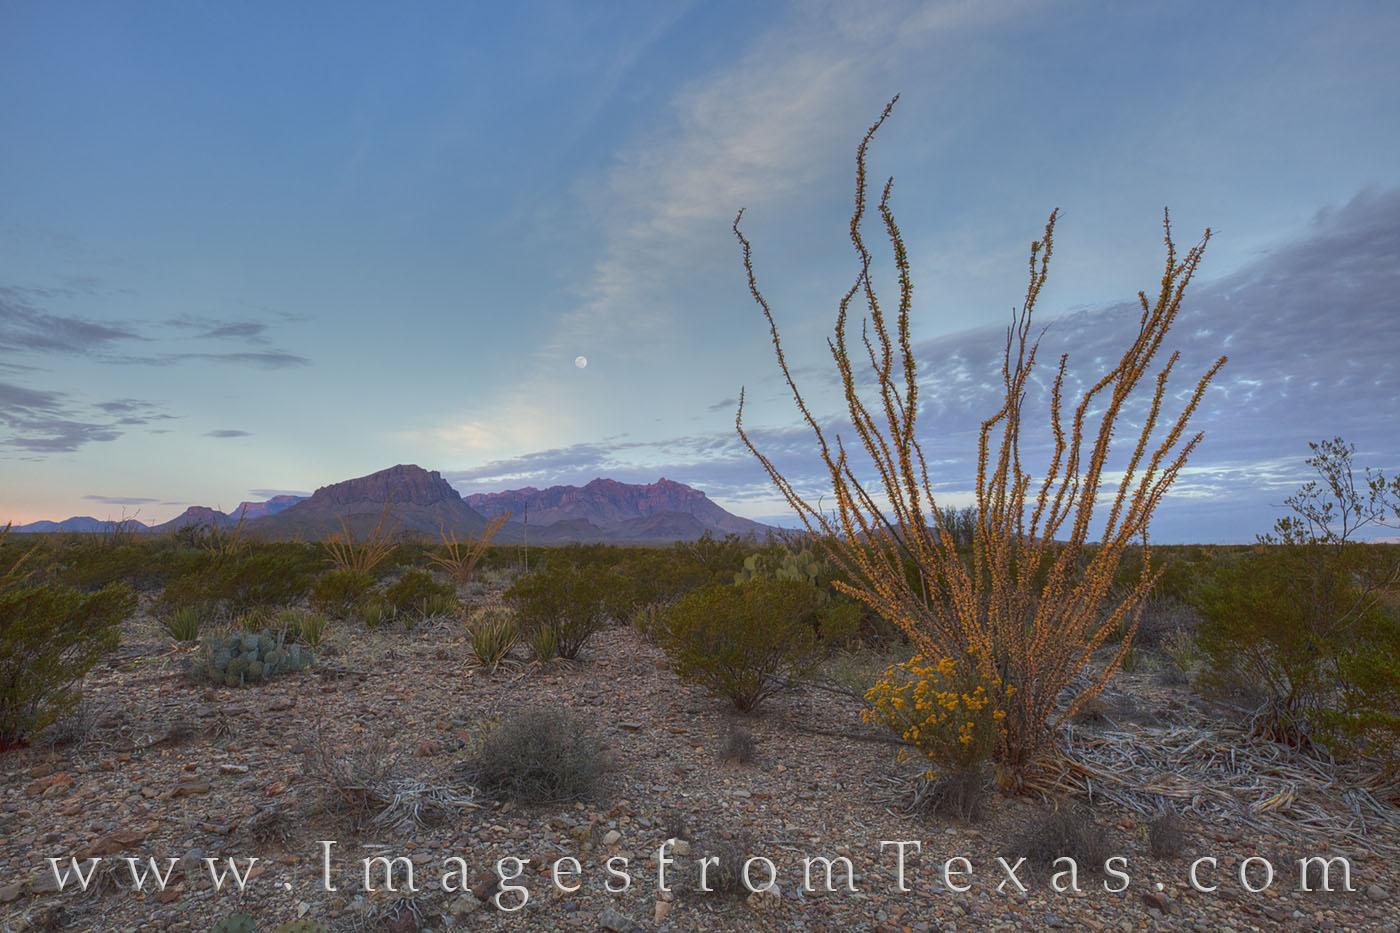 Chisos mountains, big bend national park, ocotillo, moonset, sunrise, chihuahuan desert, texas landscapes, texas hikes, chisos images, big bend images, texas national parks, photo